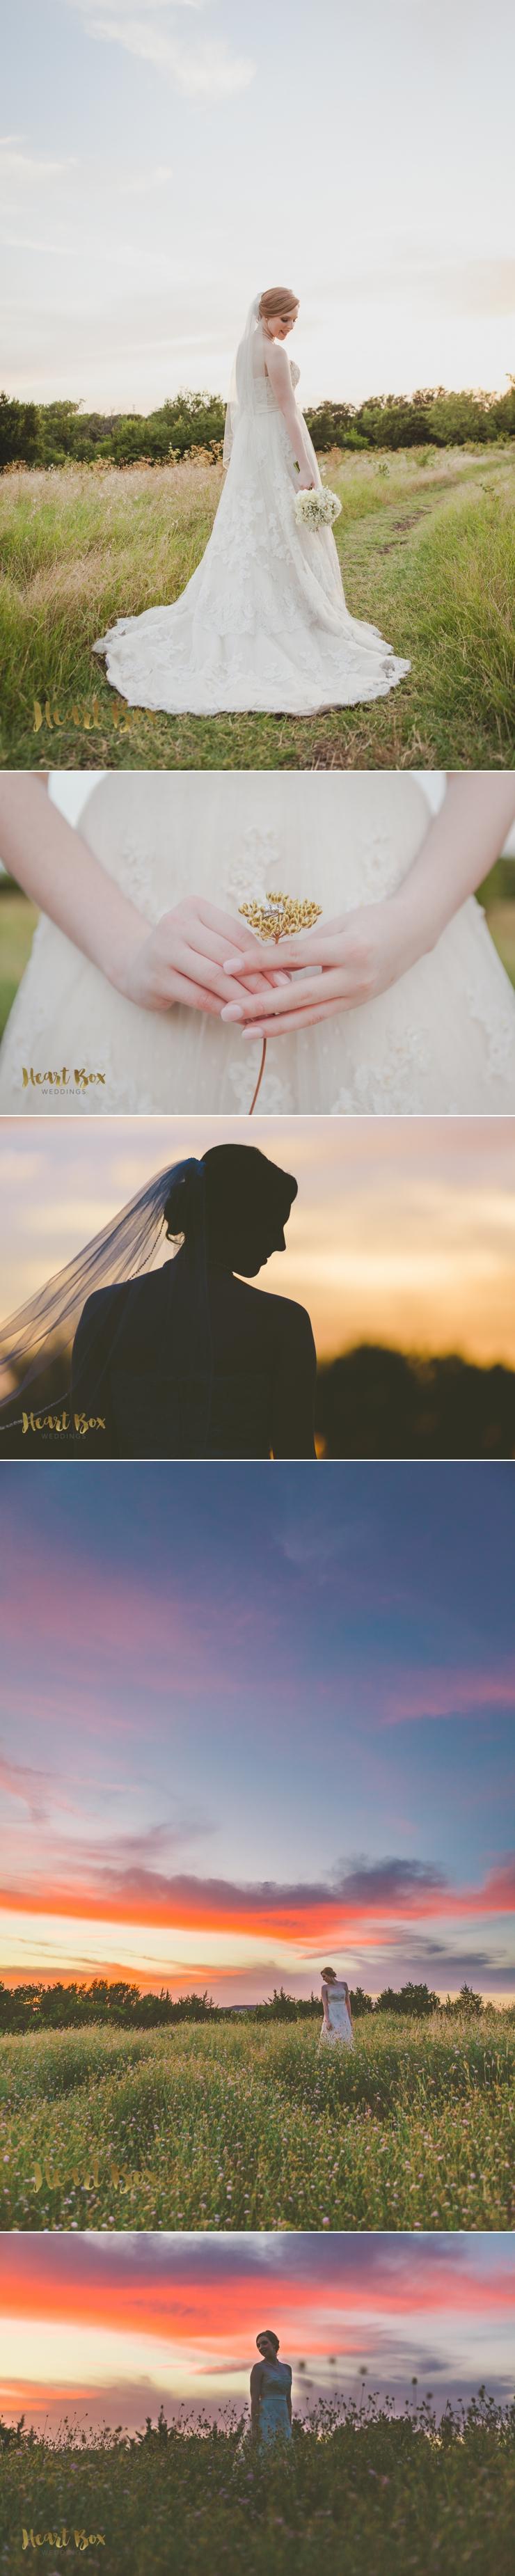 Kaylin Bridal Blog Collages 10.jpg